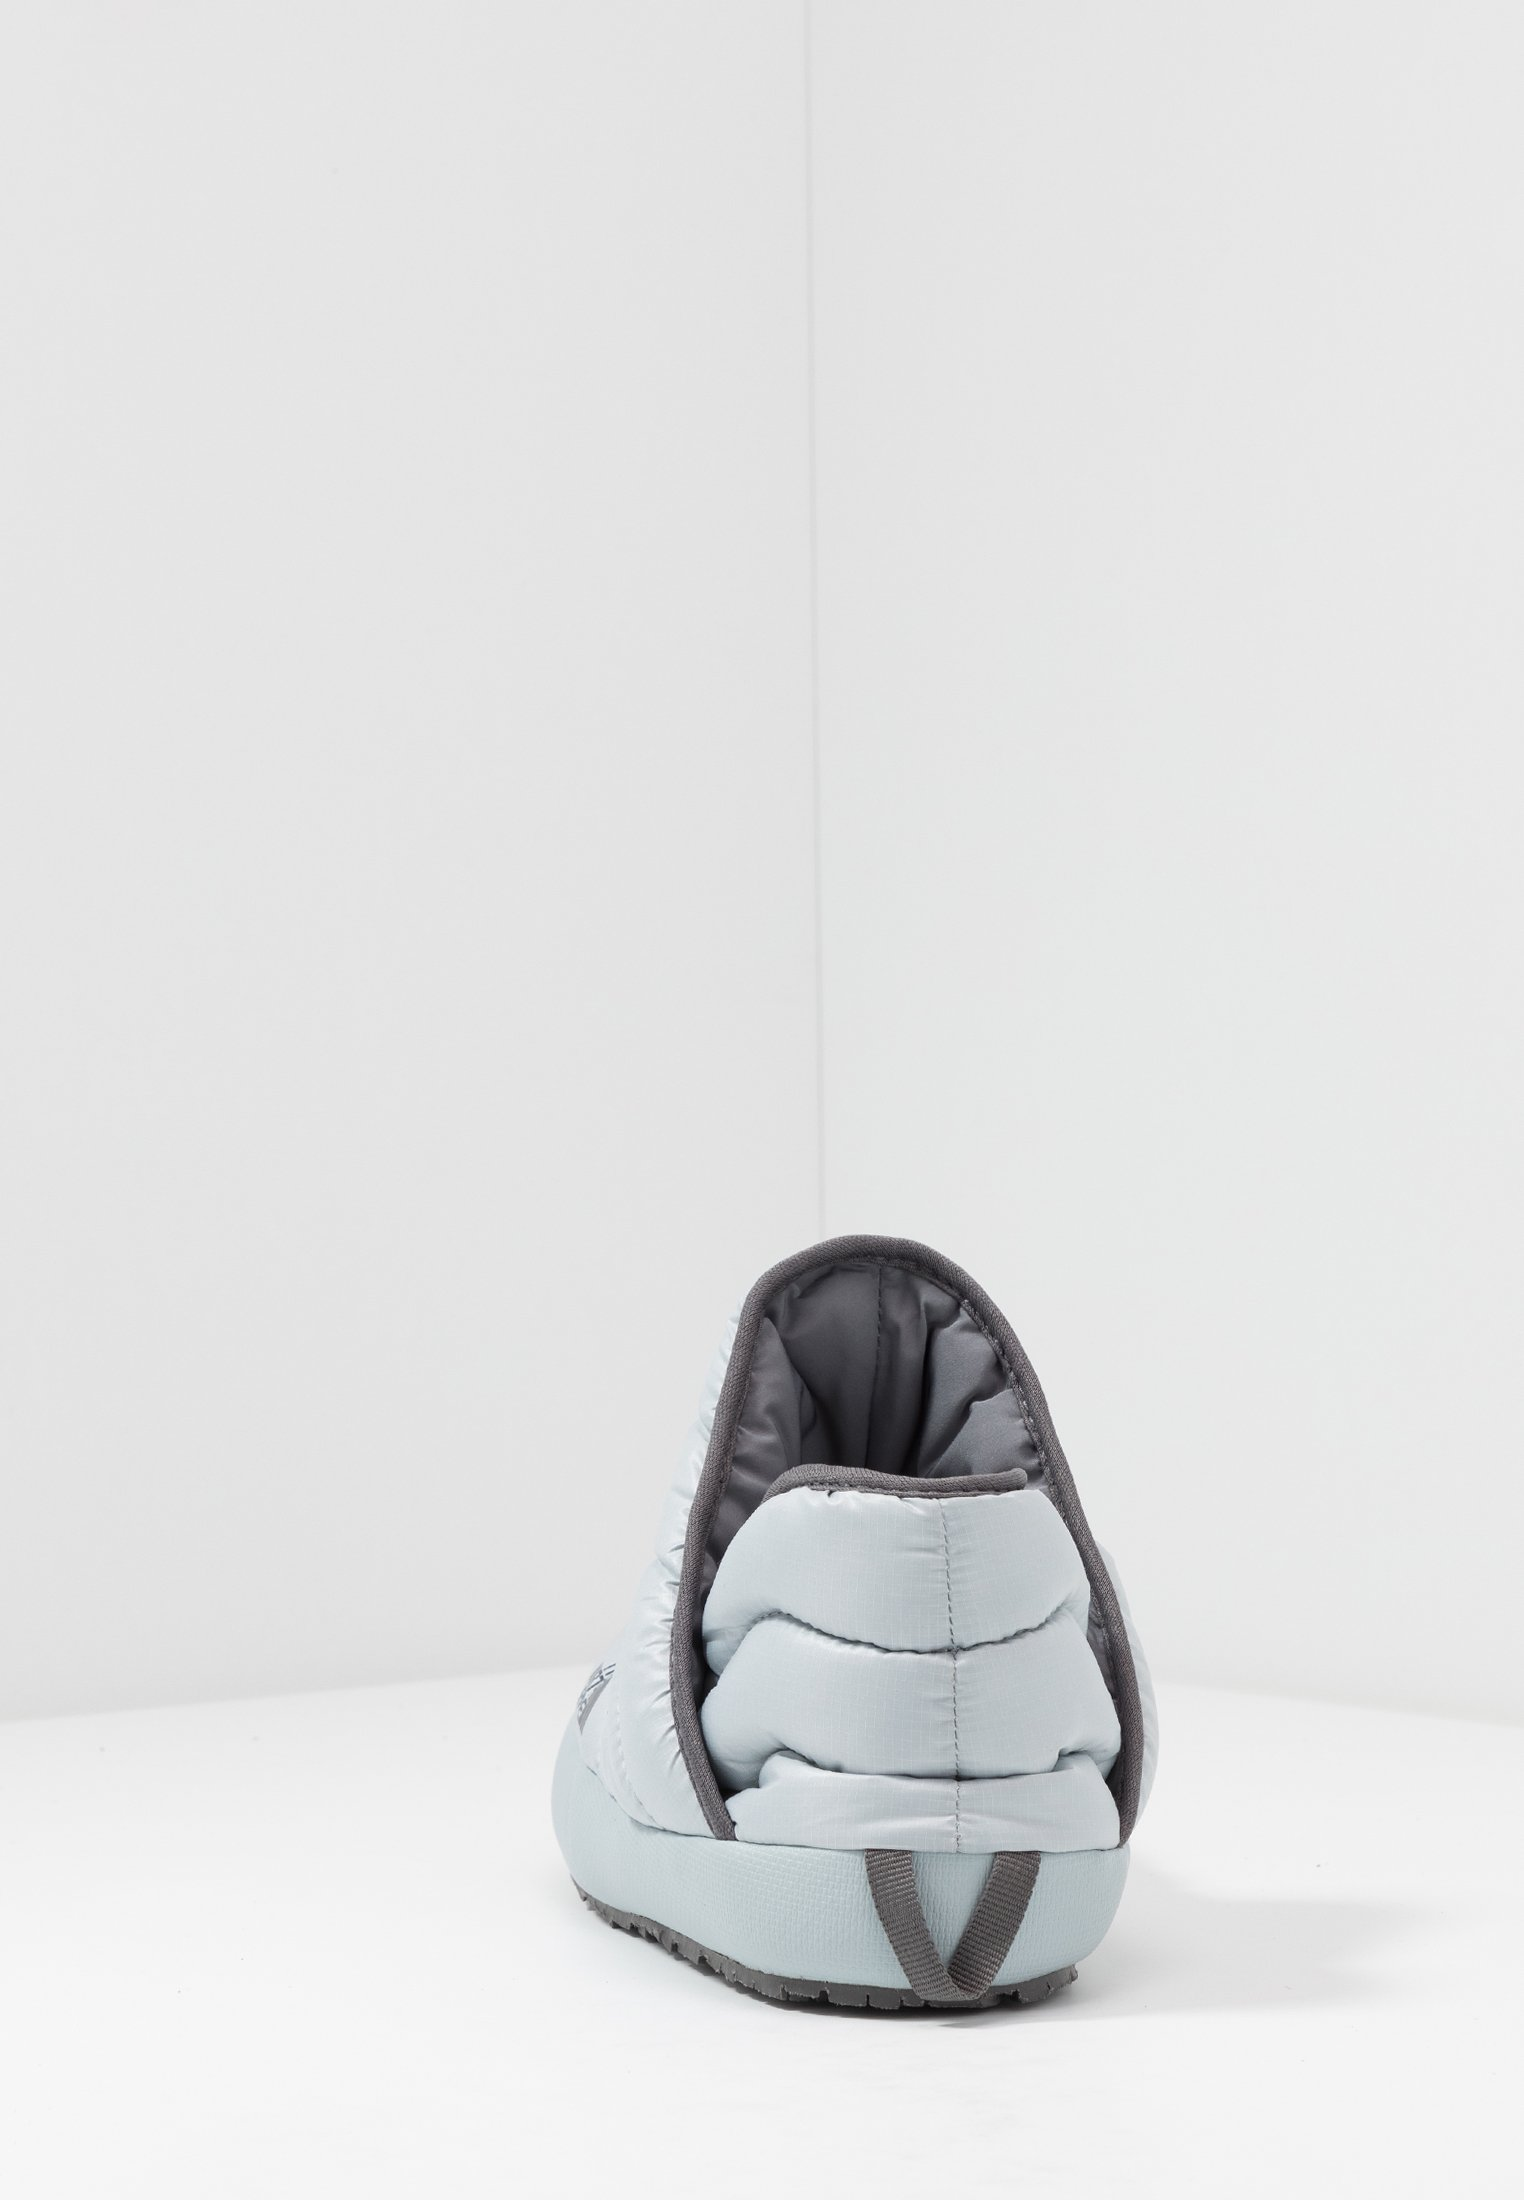 SHINY FROST SnowbootWinterstiefel high rise greyzinc grey